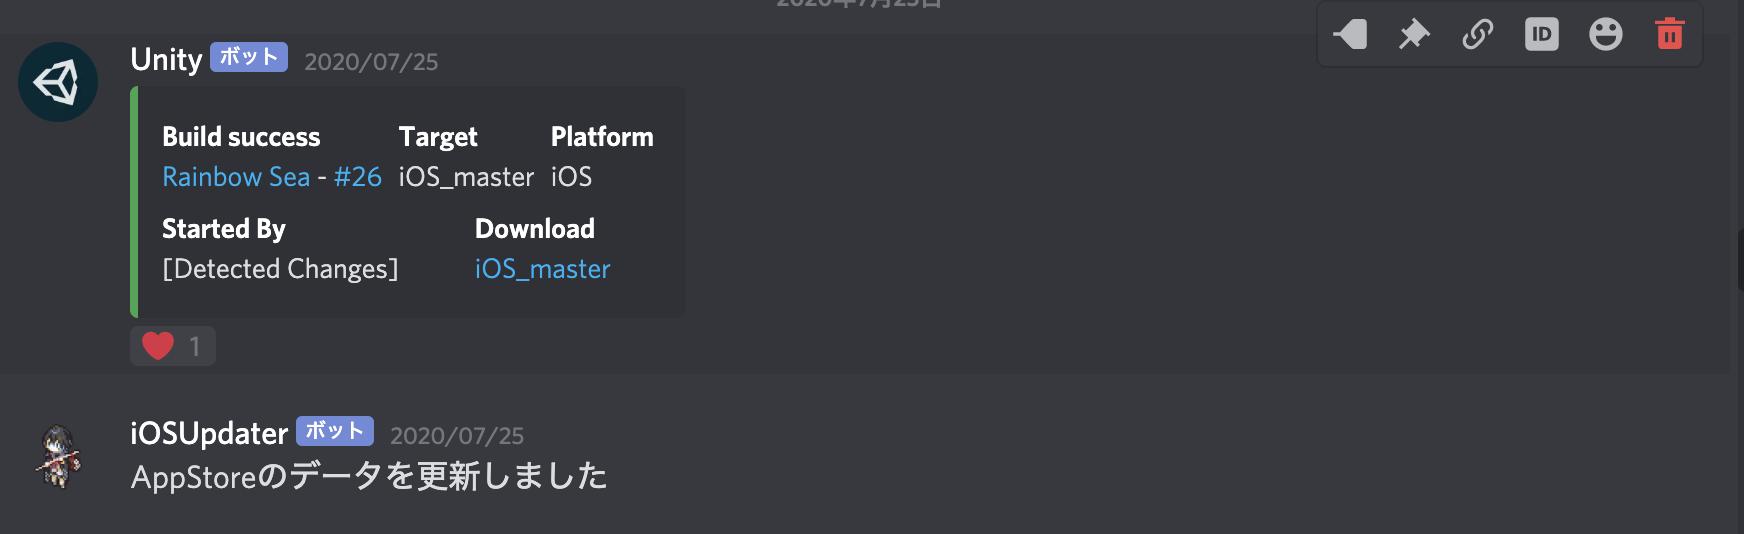 Unity Cloud Build ▶︎ Discord ▶︎ TestFlight 自動化